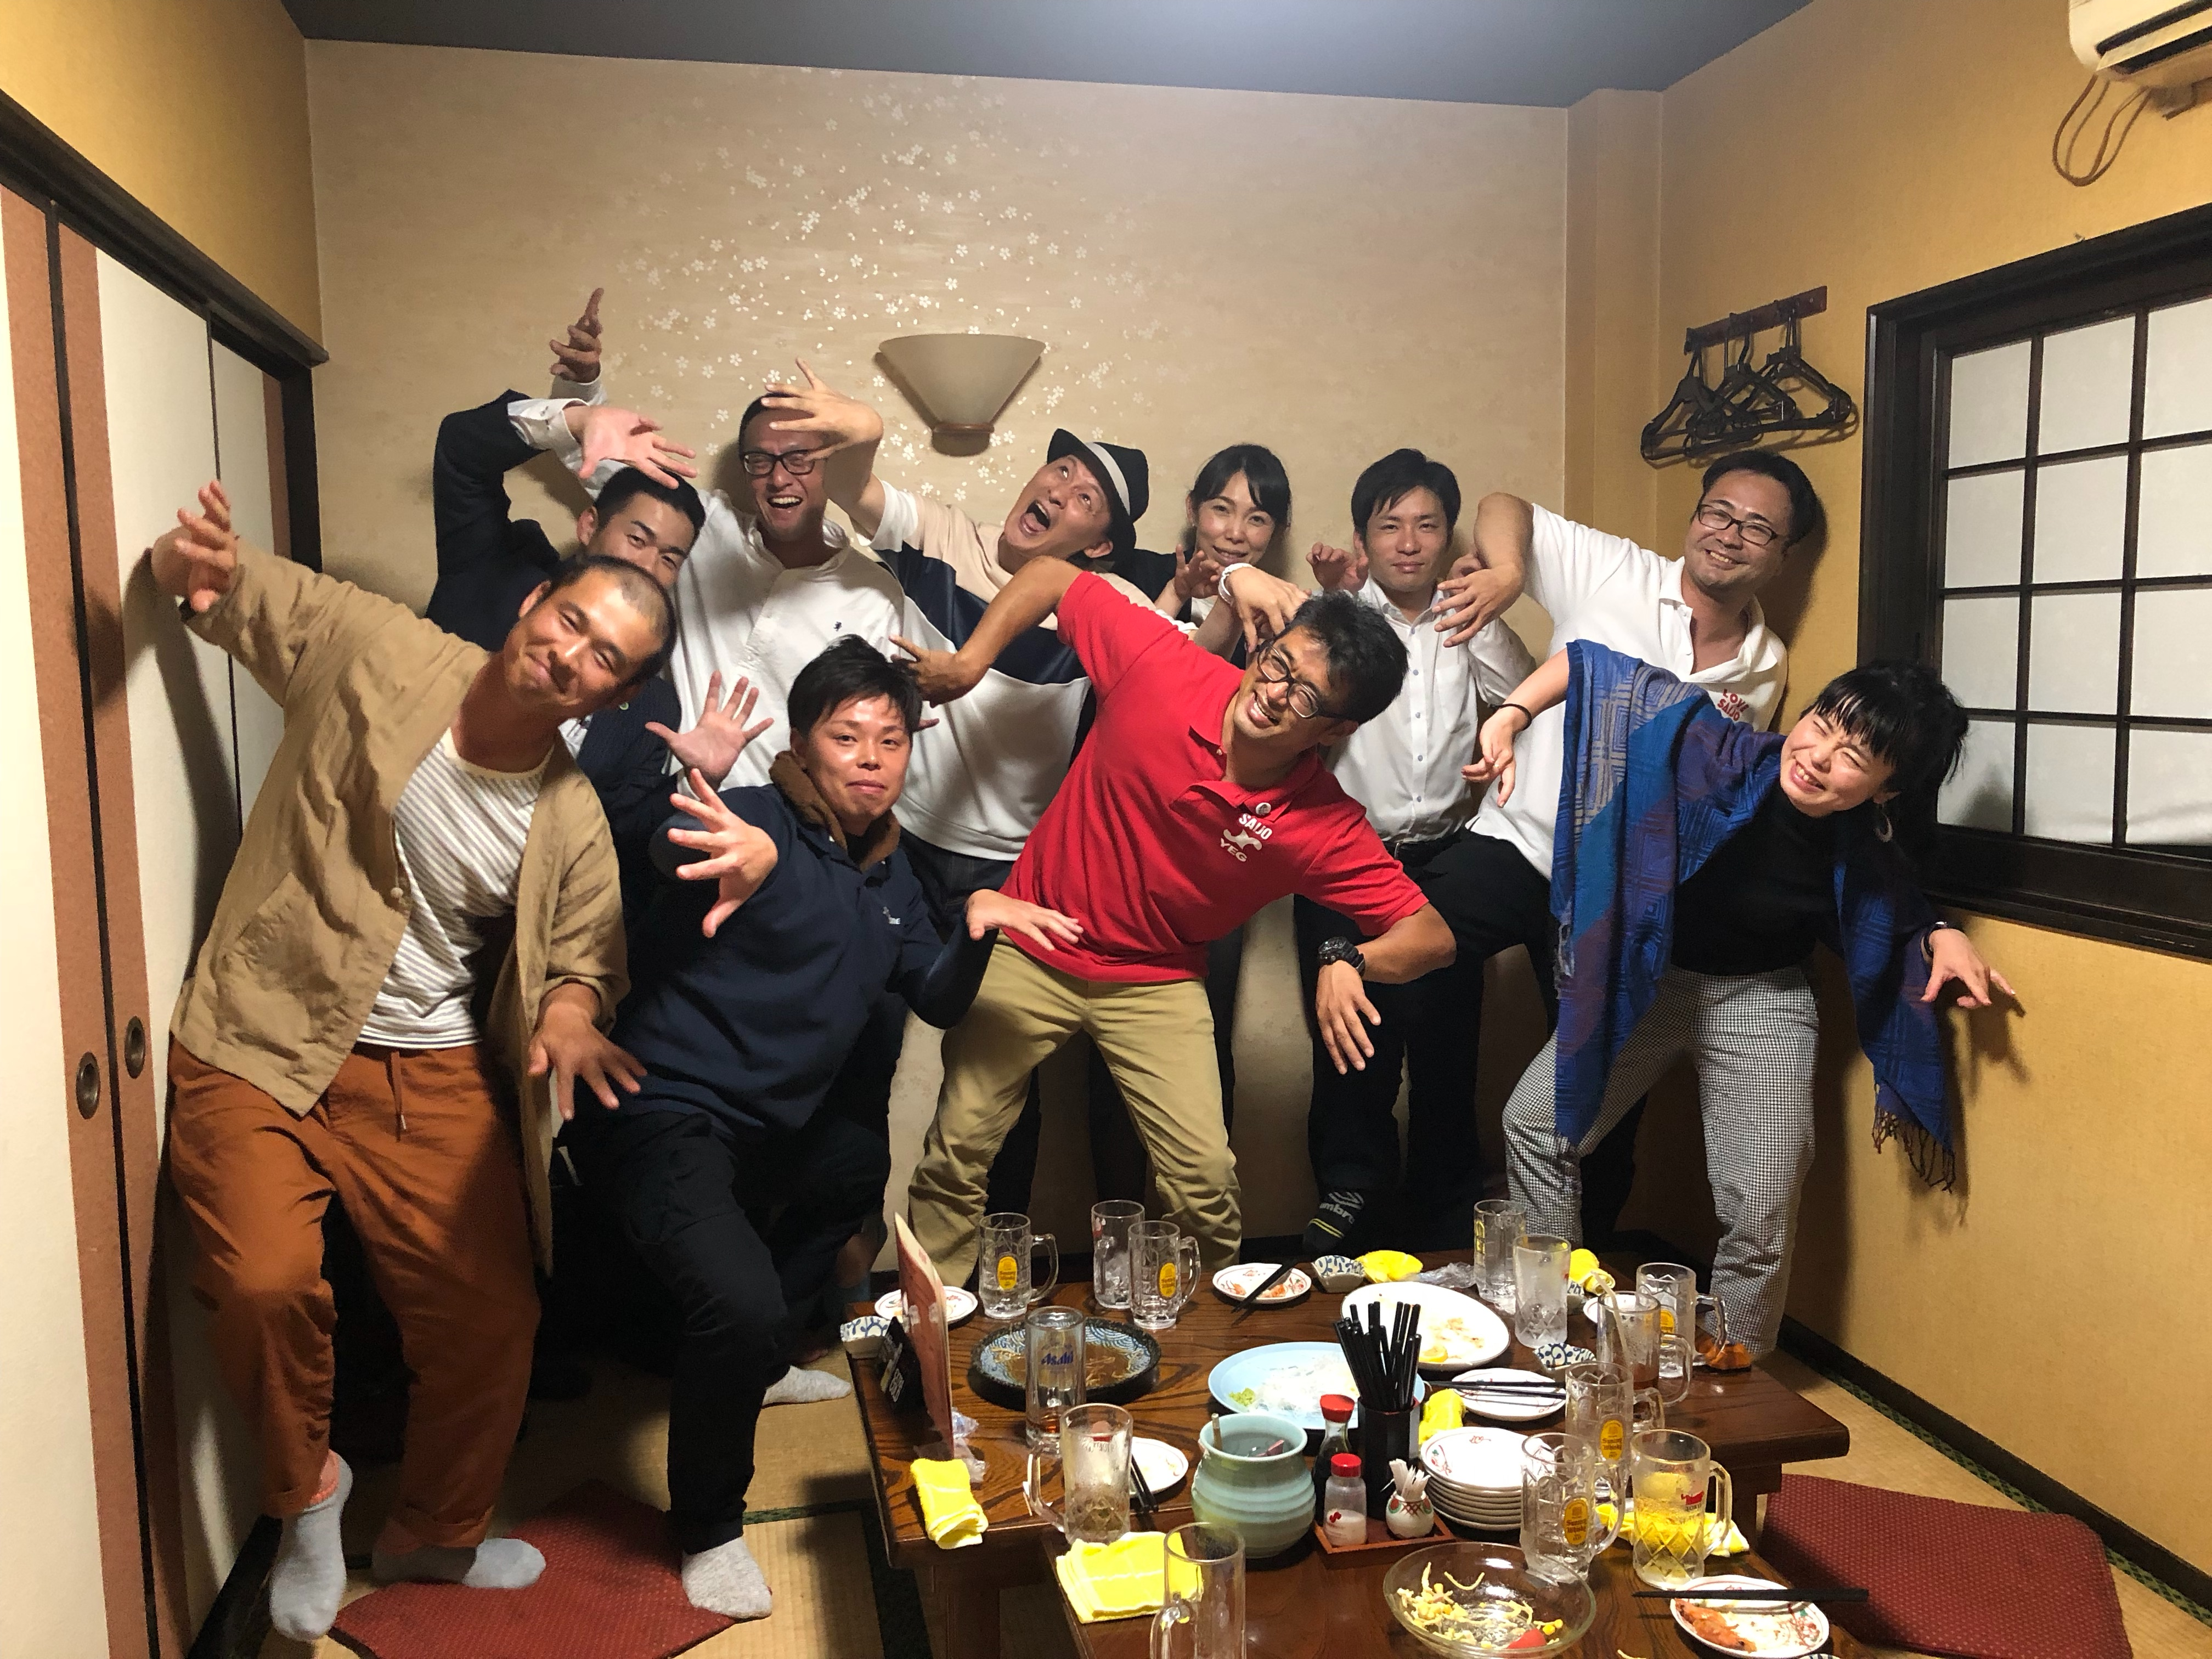 f:id:masanori-kato1972:20190331105012j:image